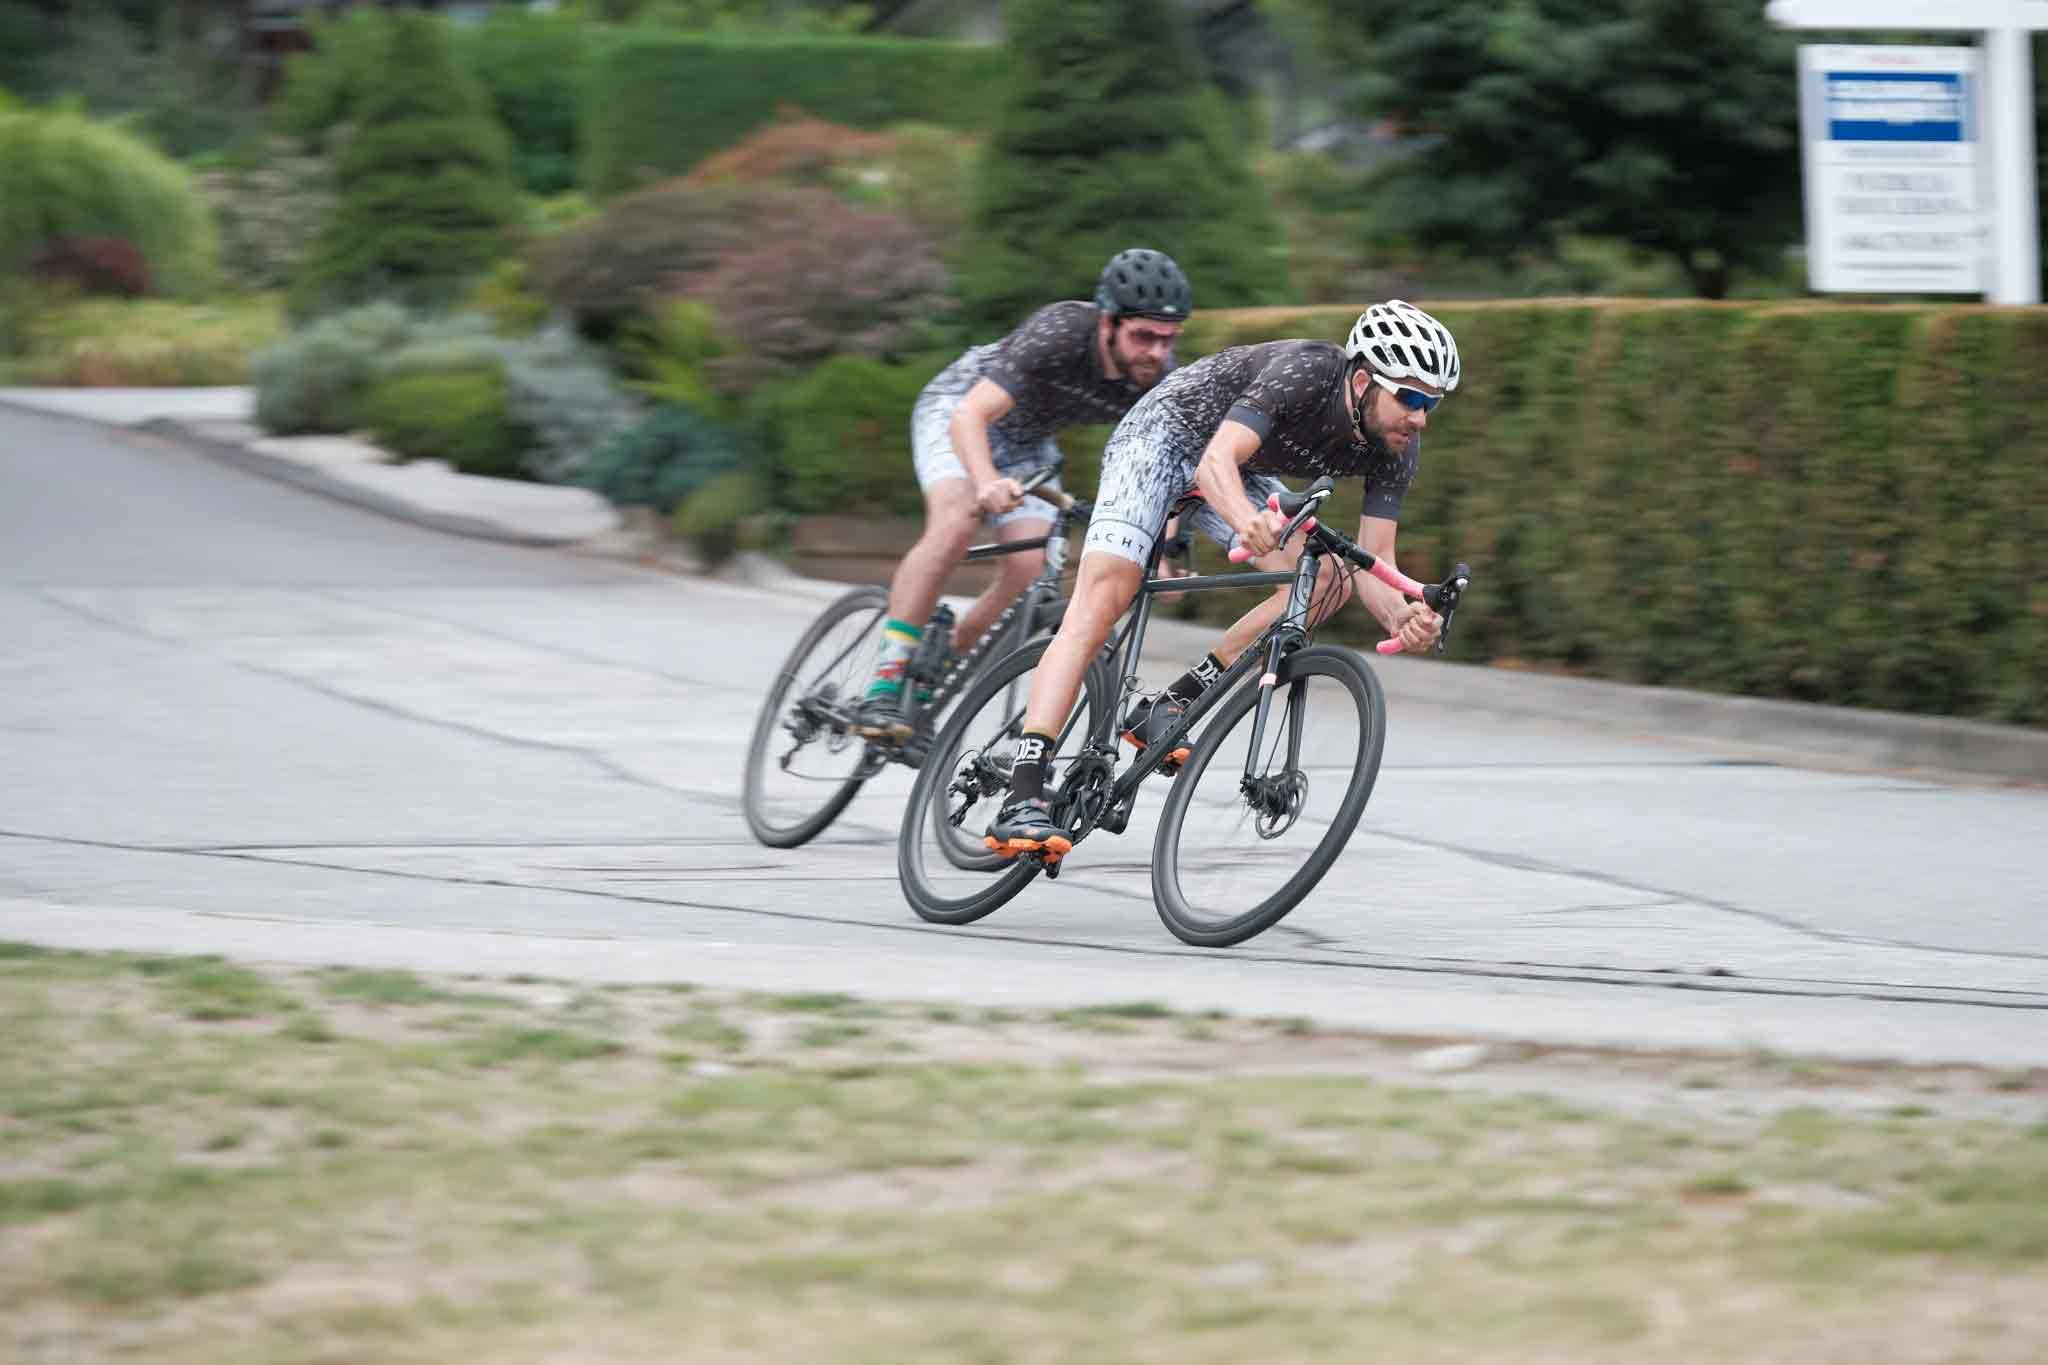 Travis-Strebb-Riding-Landyachtz-Bikes-Million-Vertical-Feet